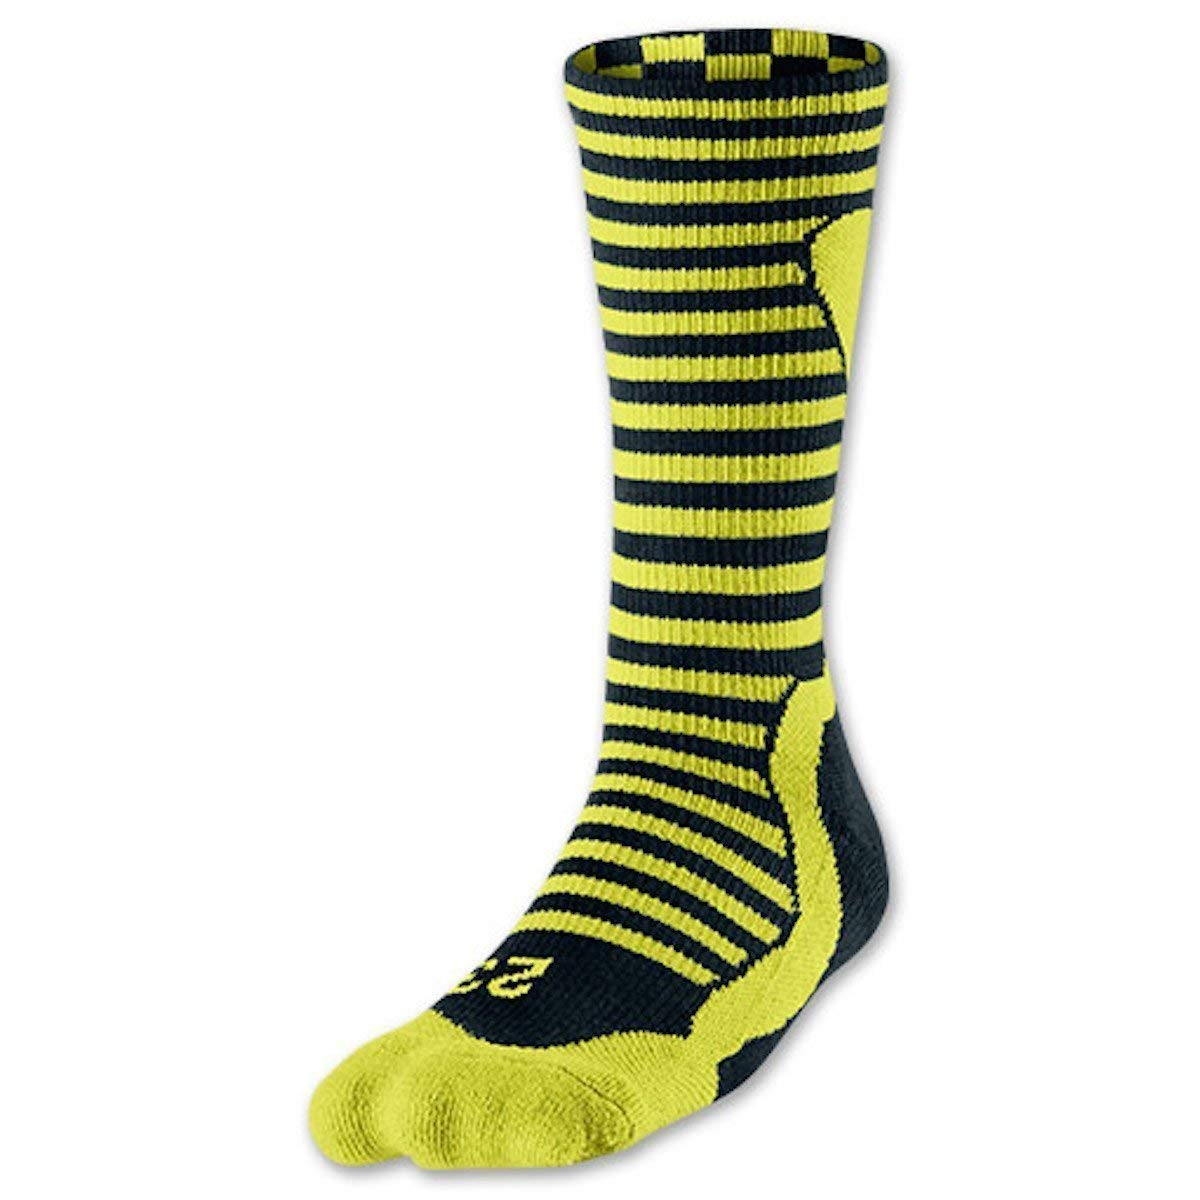 8-12 Venom Green Black Jordan Mens Retro 10 Bobcat Crew Socks Large